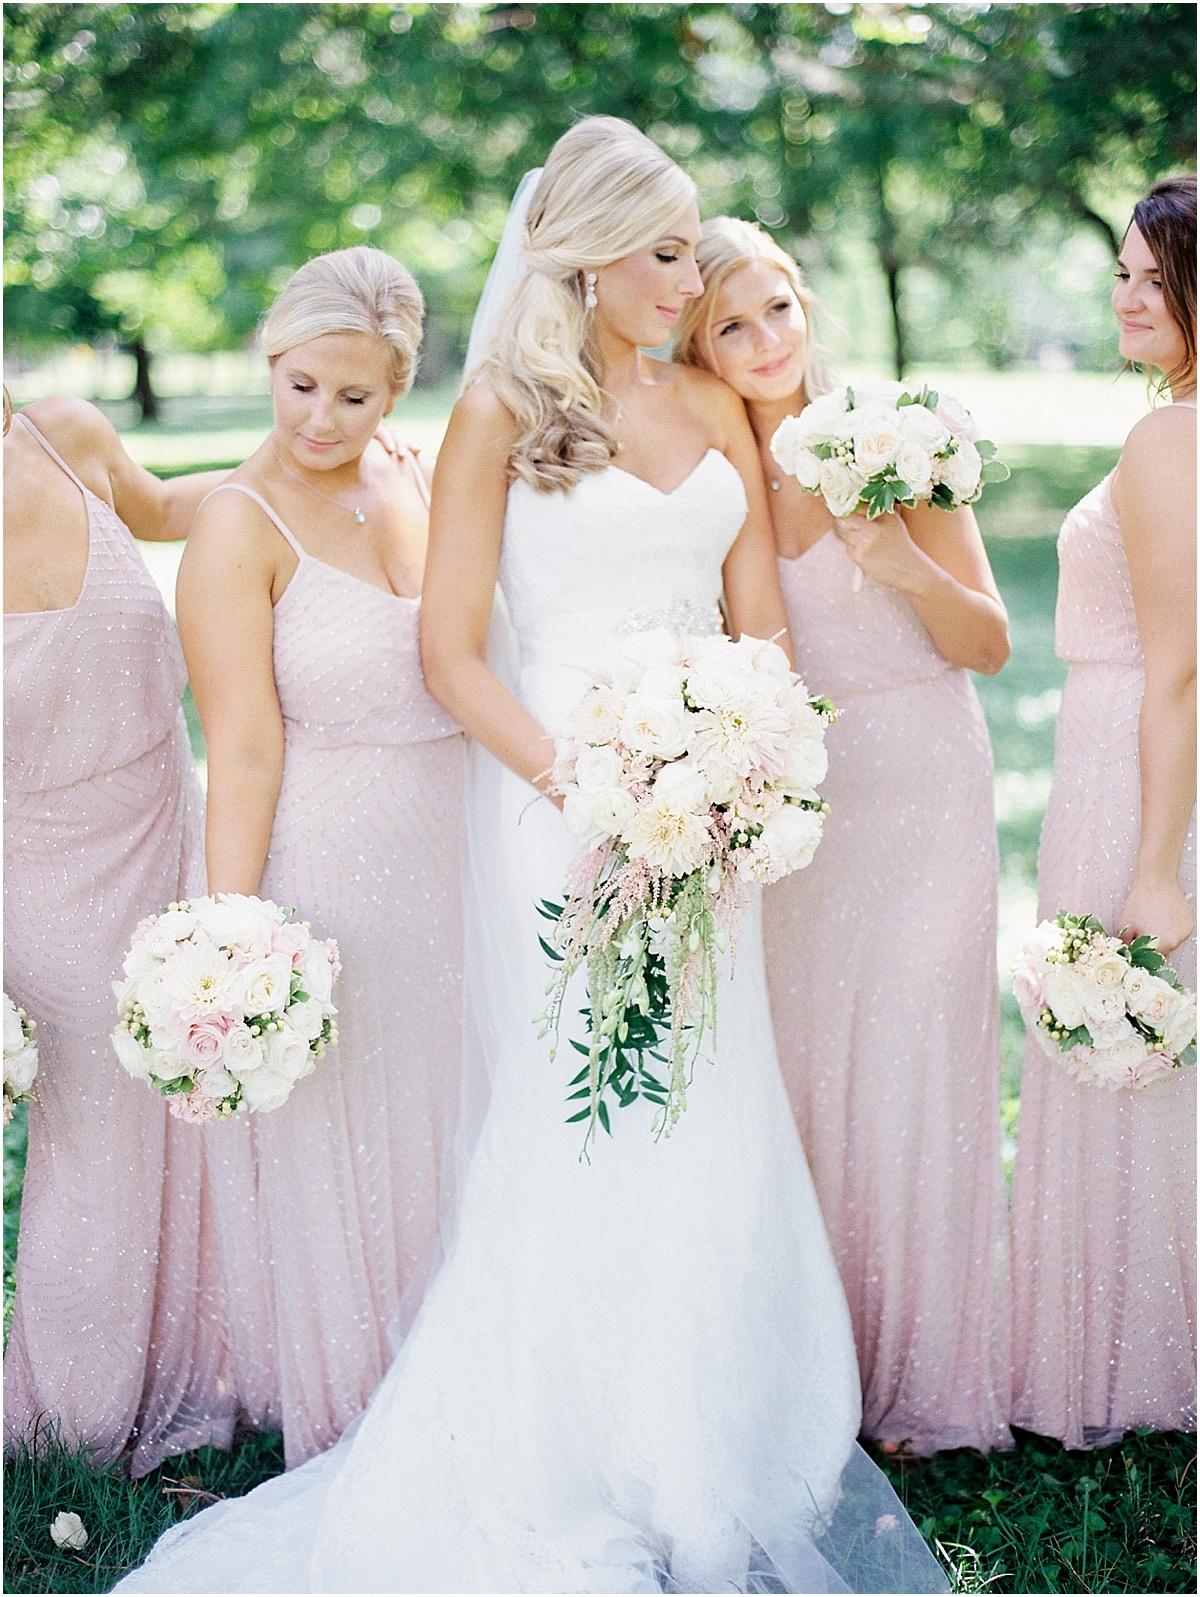 St_Louis_Wedding_Fine_Art_Film_Photographer_Jordan_Brittley_(www.jordanbrittley.com)_0032.jpg